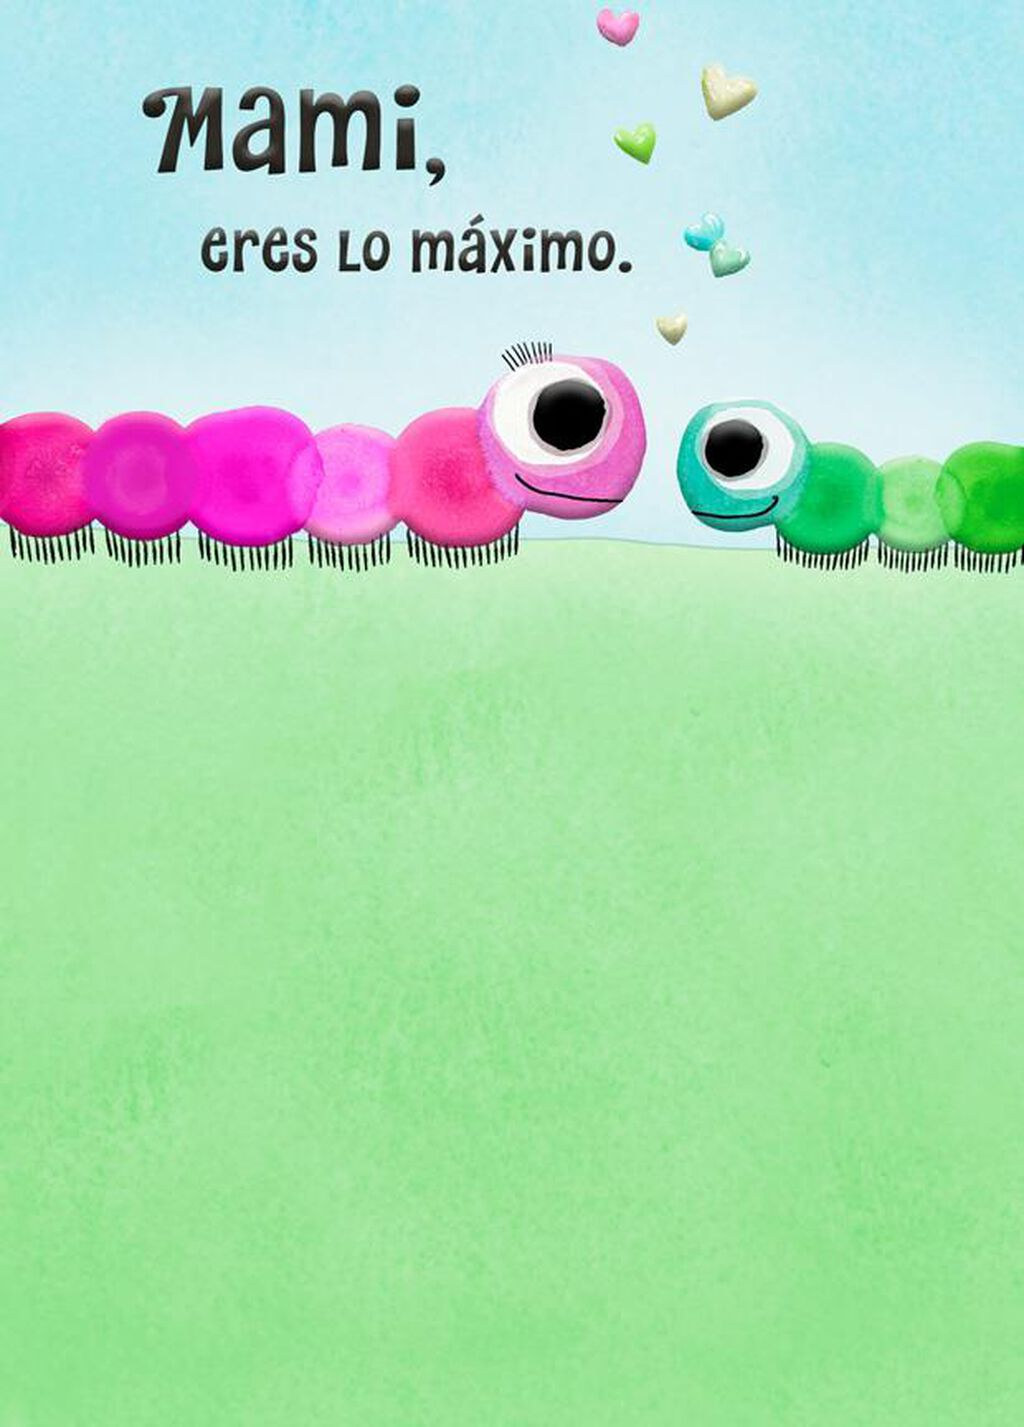 Caterpillar Love Spanish Language Birthday Card For Mom